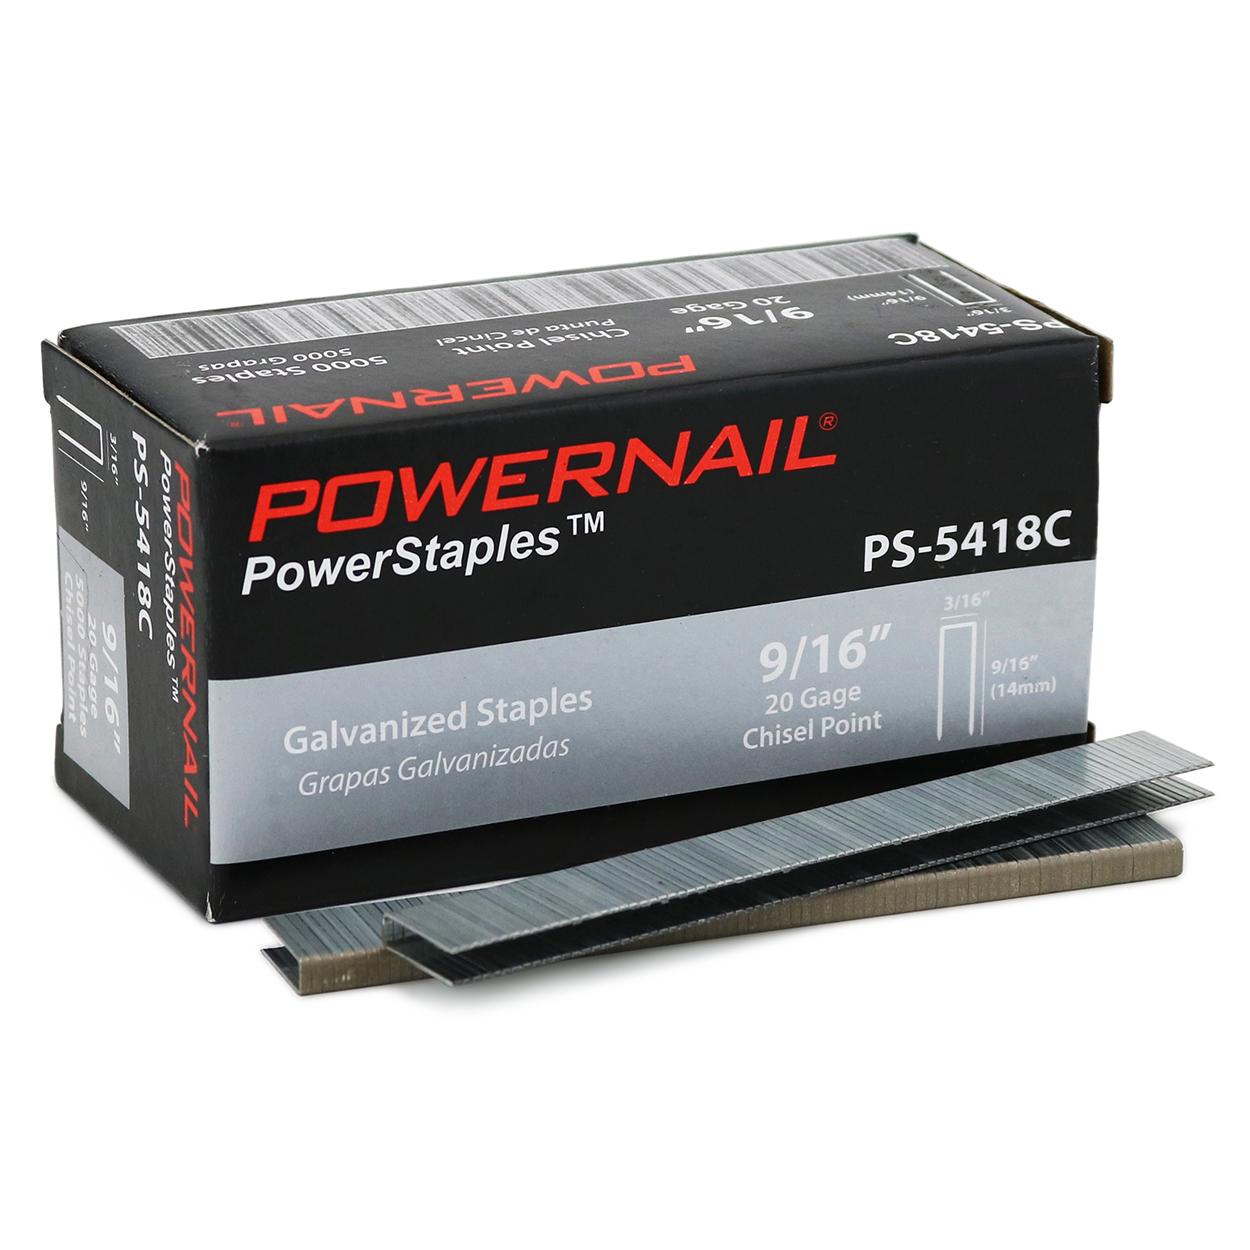 Powernail PS5418C staples